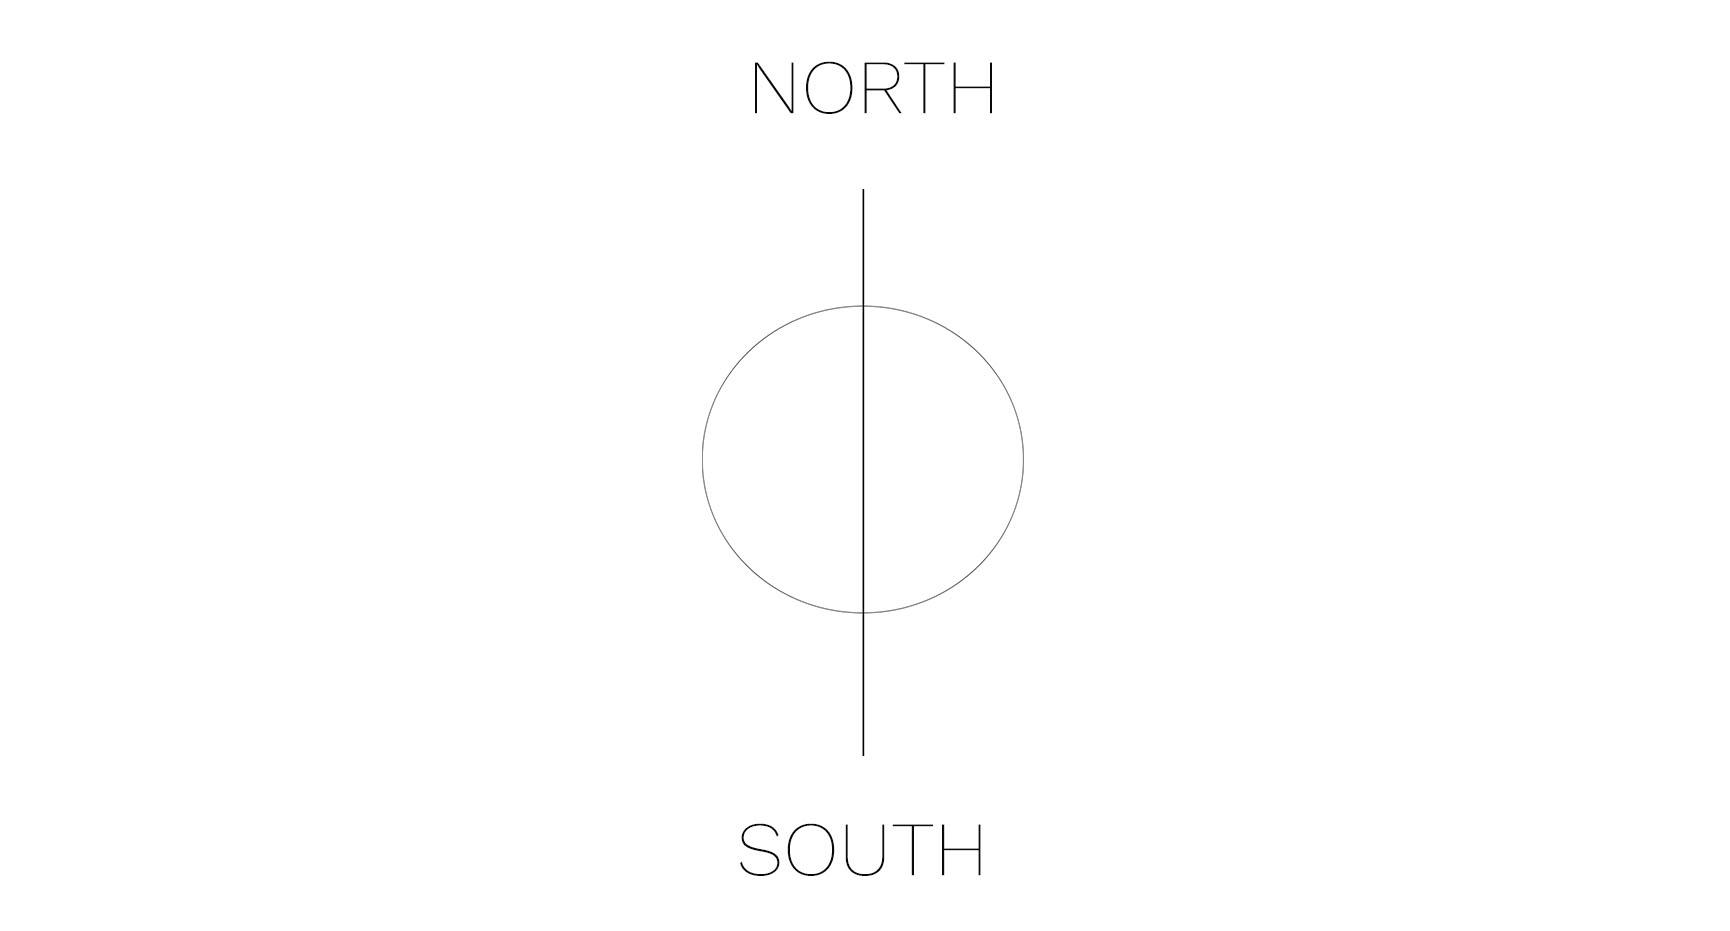 NorthSouthNode.jpg